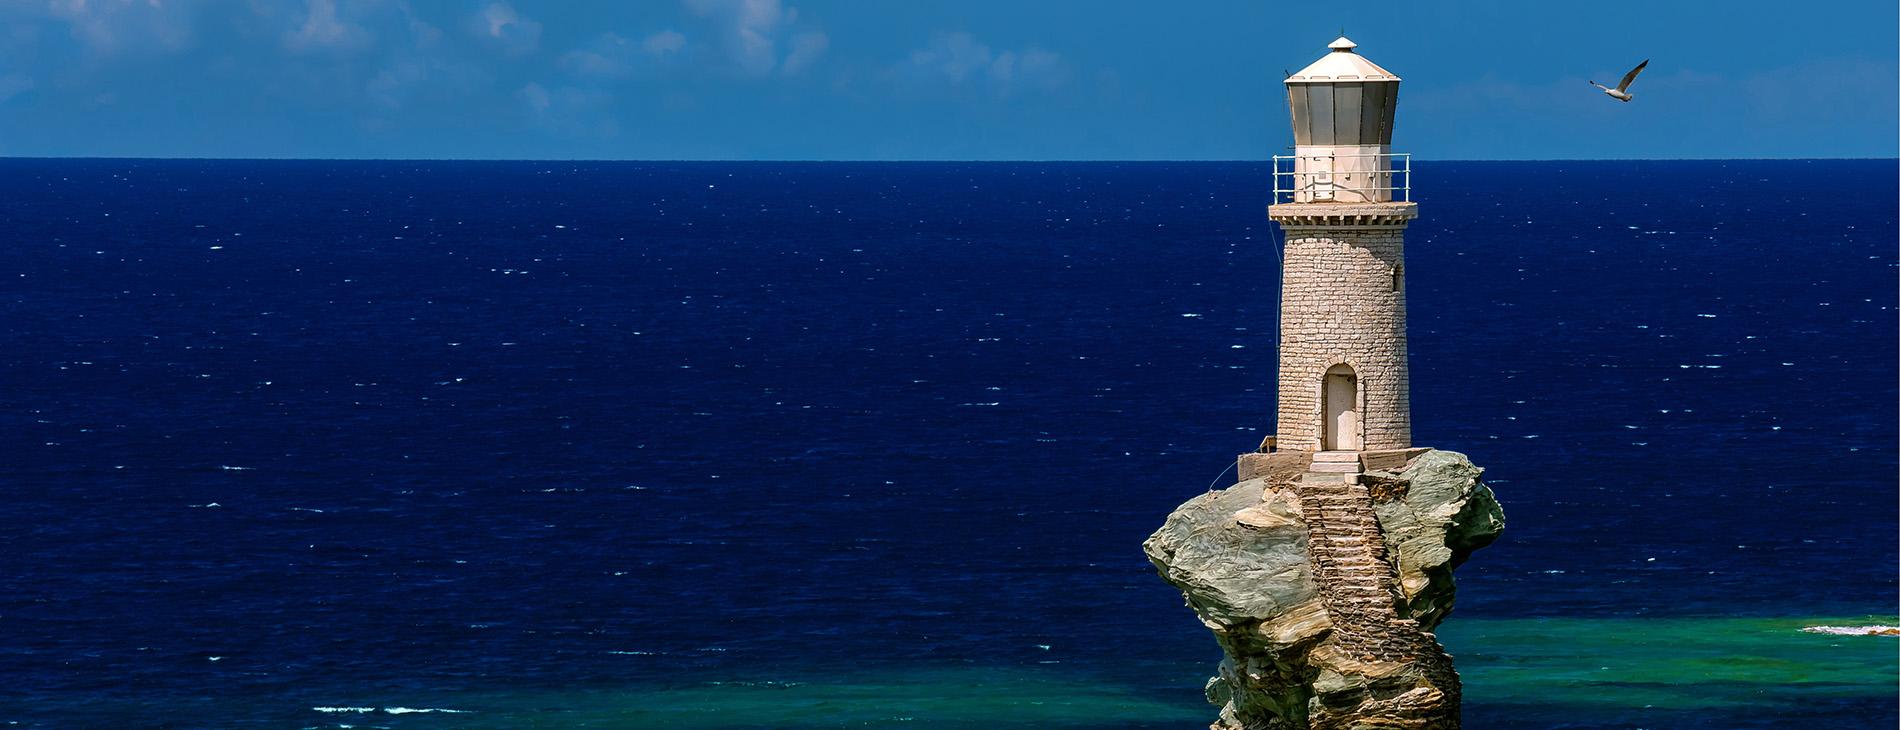 Lighthouse photo by Lemonakis Antonis